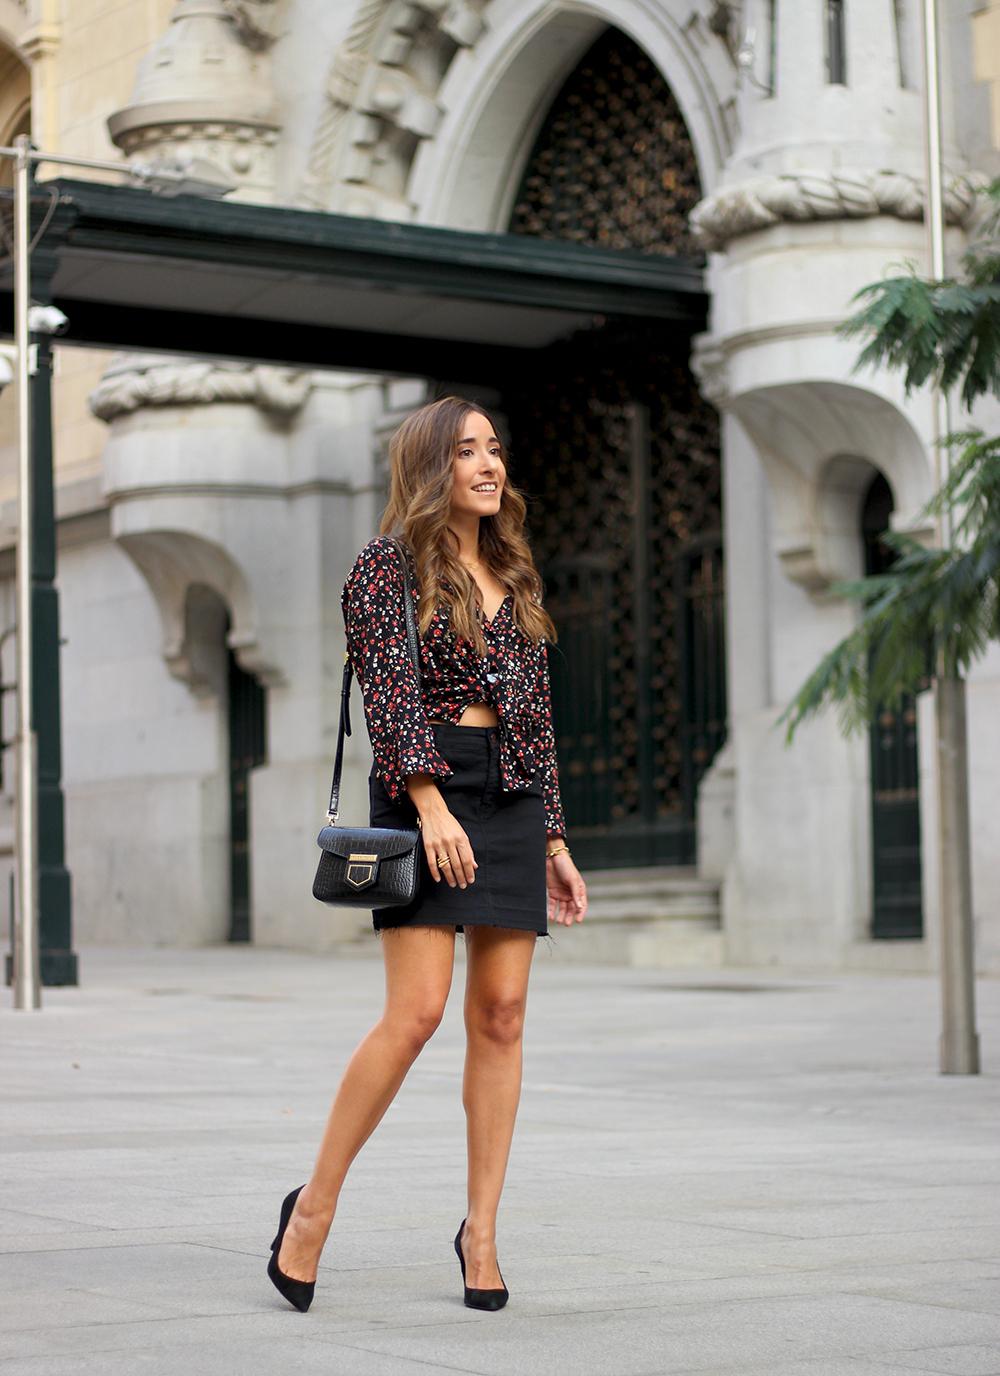 black flower shirt black denim skirt black heels givenchy bag autumn outfit street style 201804